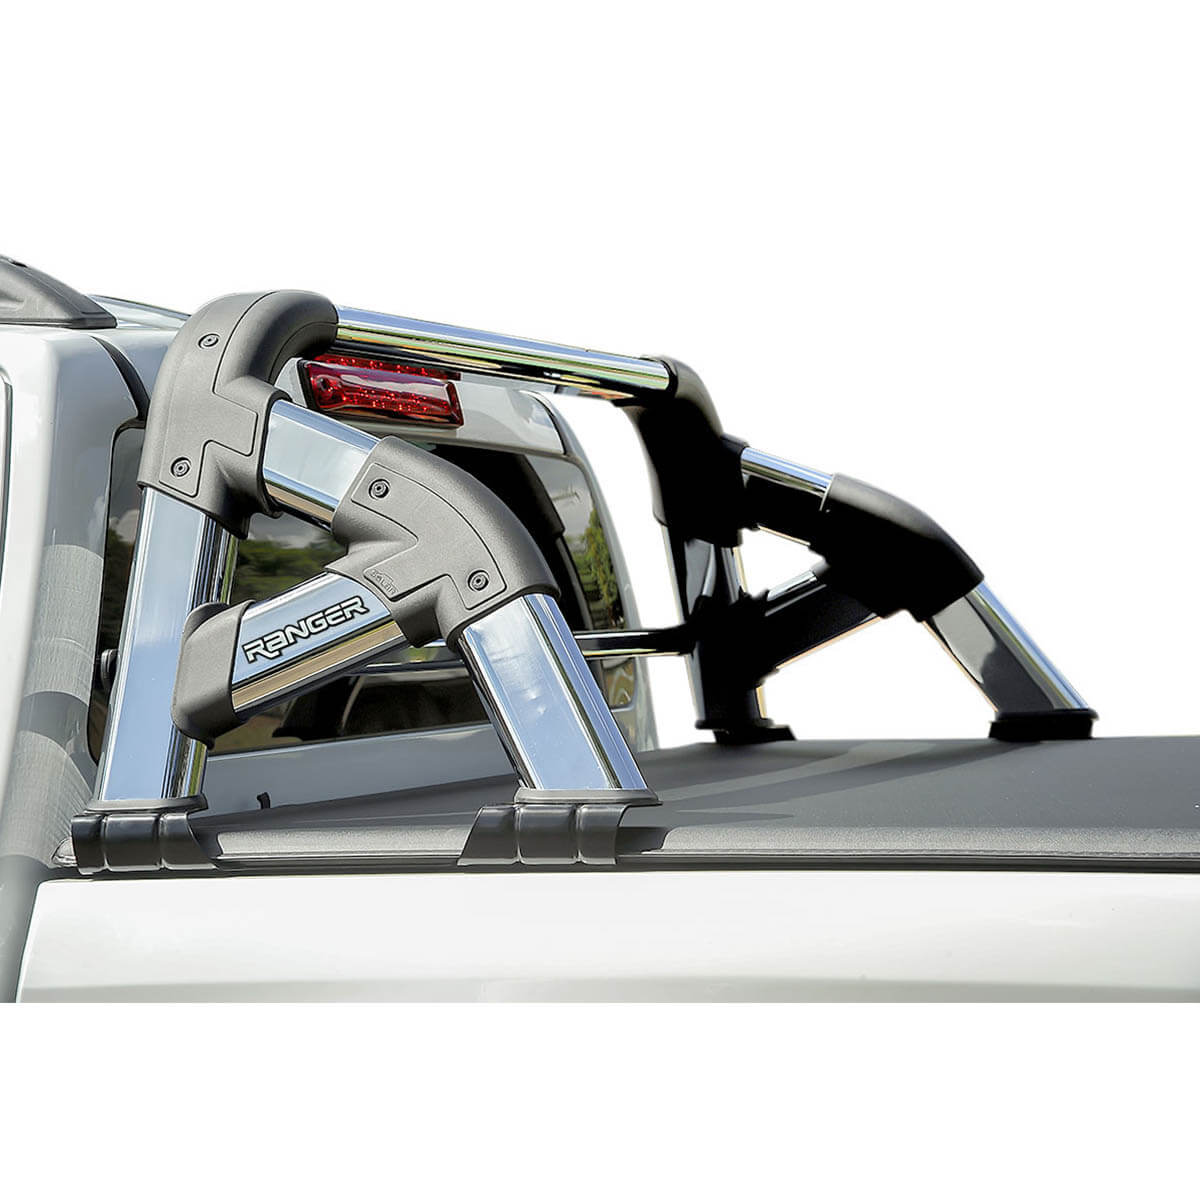 Santo antônio cromado Solar Exclusive Nova Ranger 2013 a 2018 com barra de vidro cromada